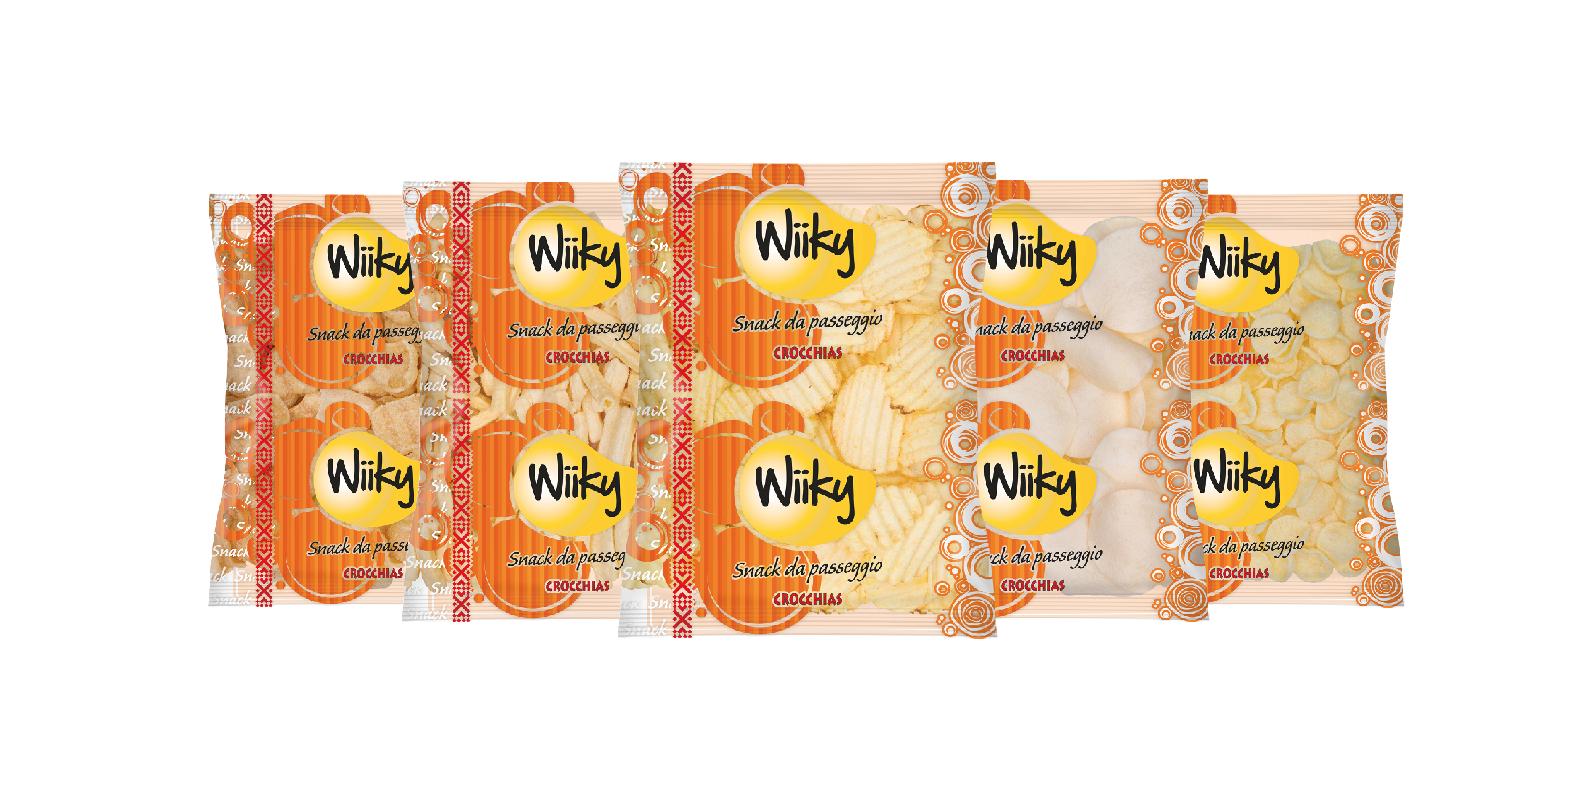 Wiiky_pack_linea